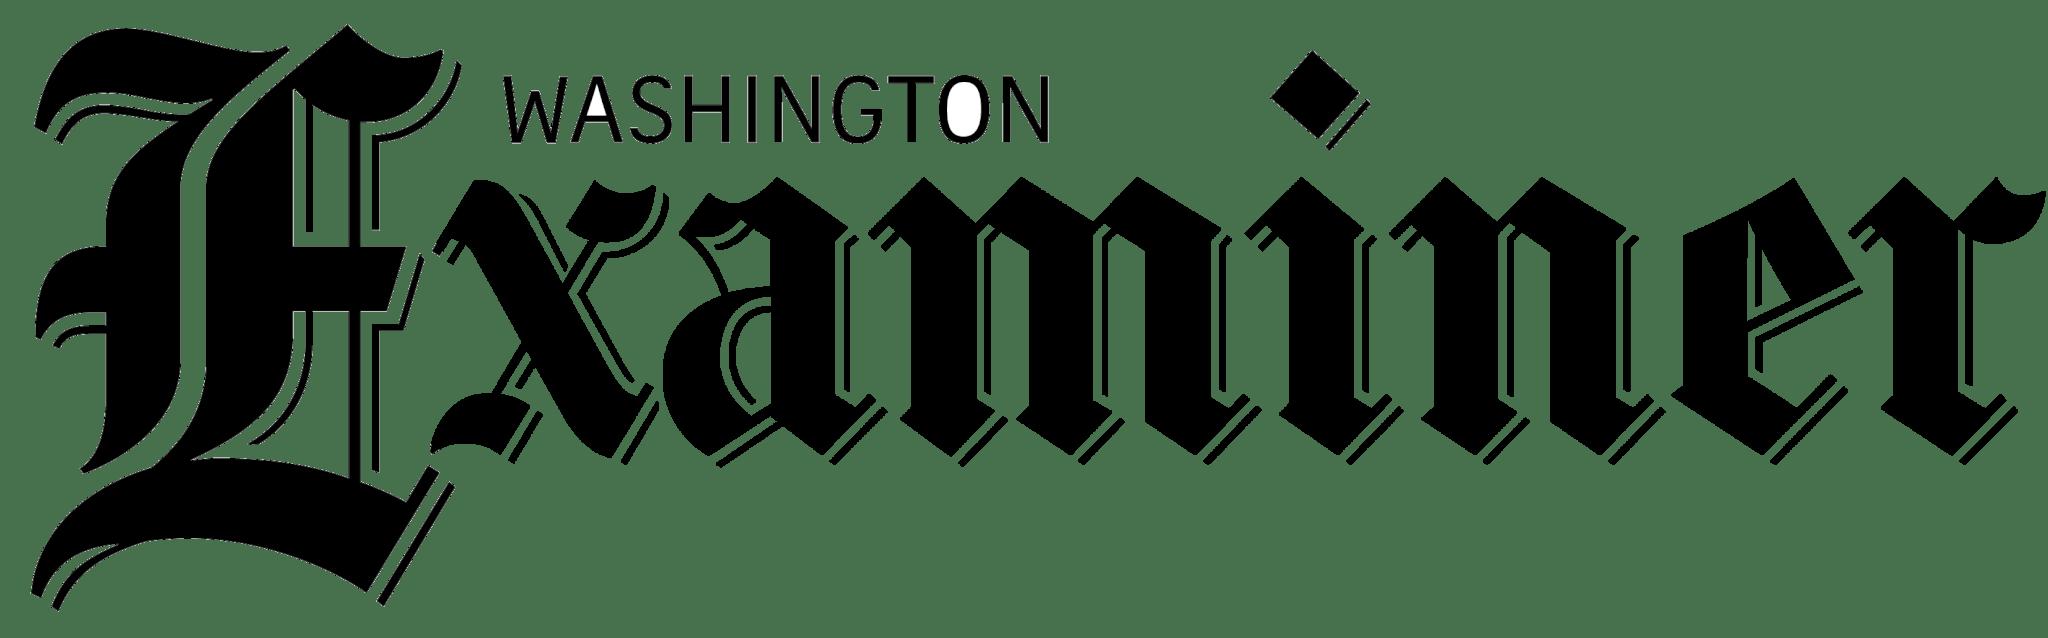 washington-examiner-logo